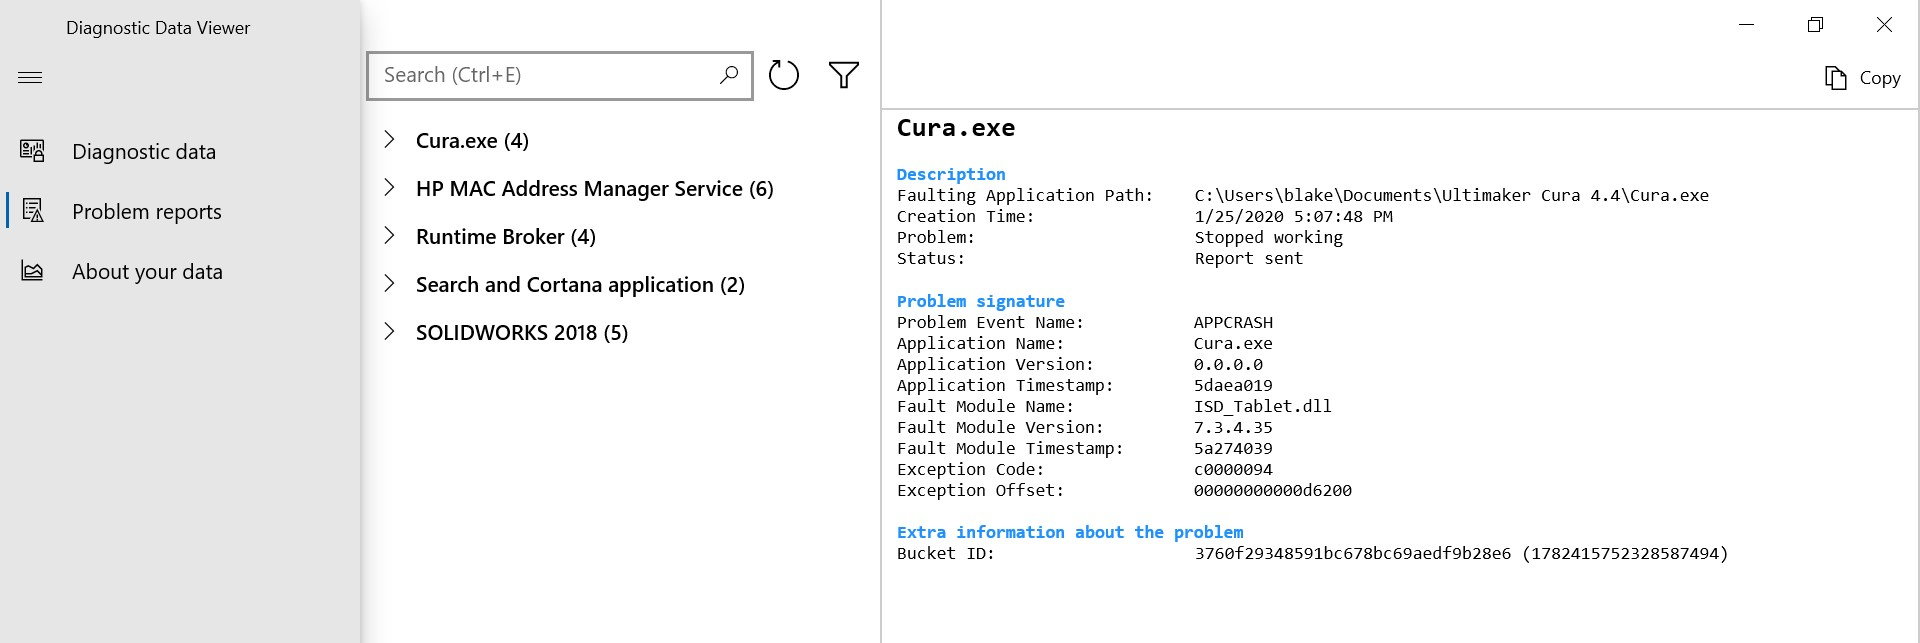 Cura 4.4.1 Crash on Launch 73c60581-3f35-44fe-b983-681ca29f35aa?upload=true.jpg